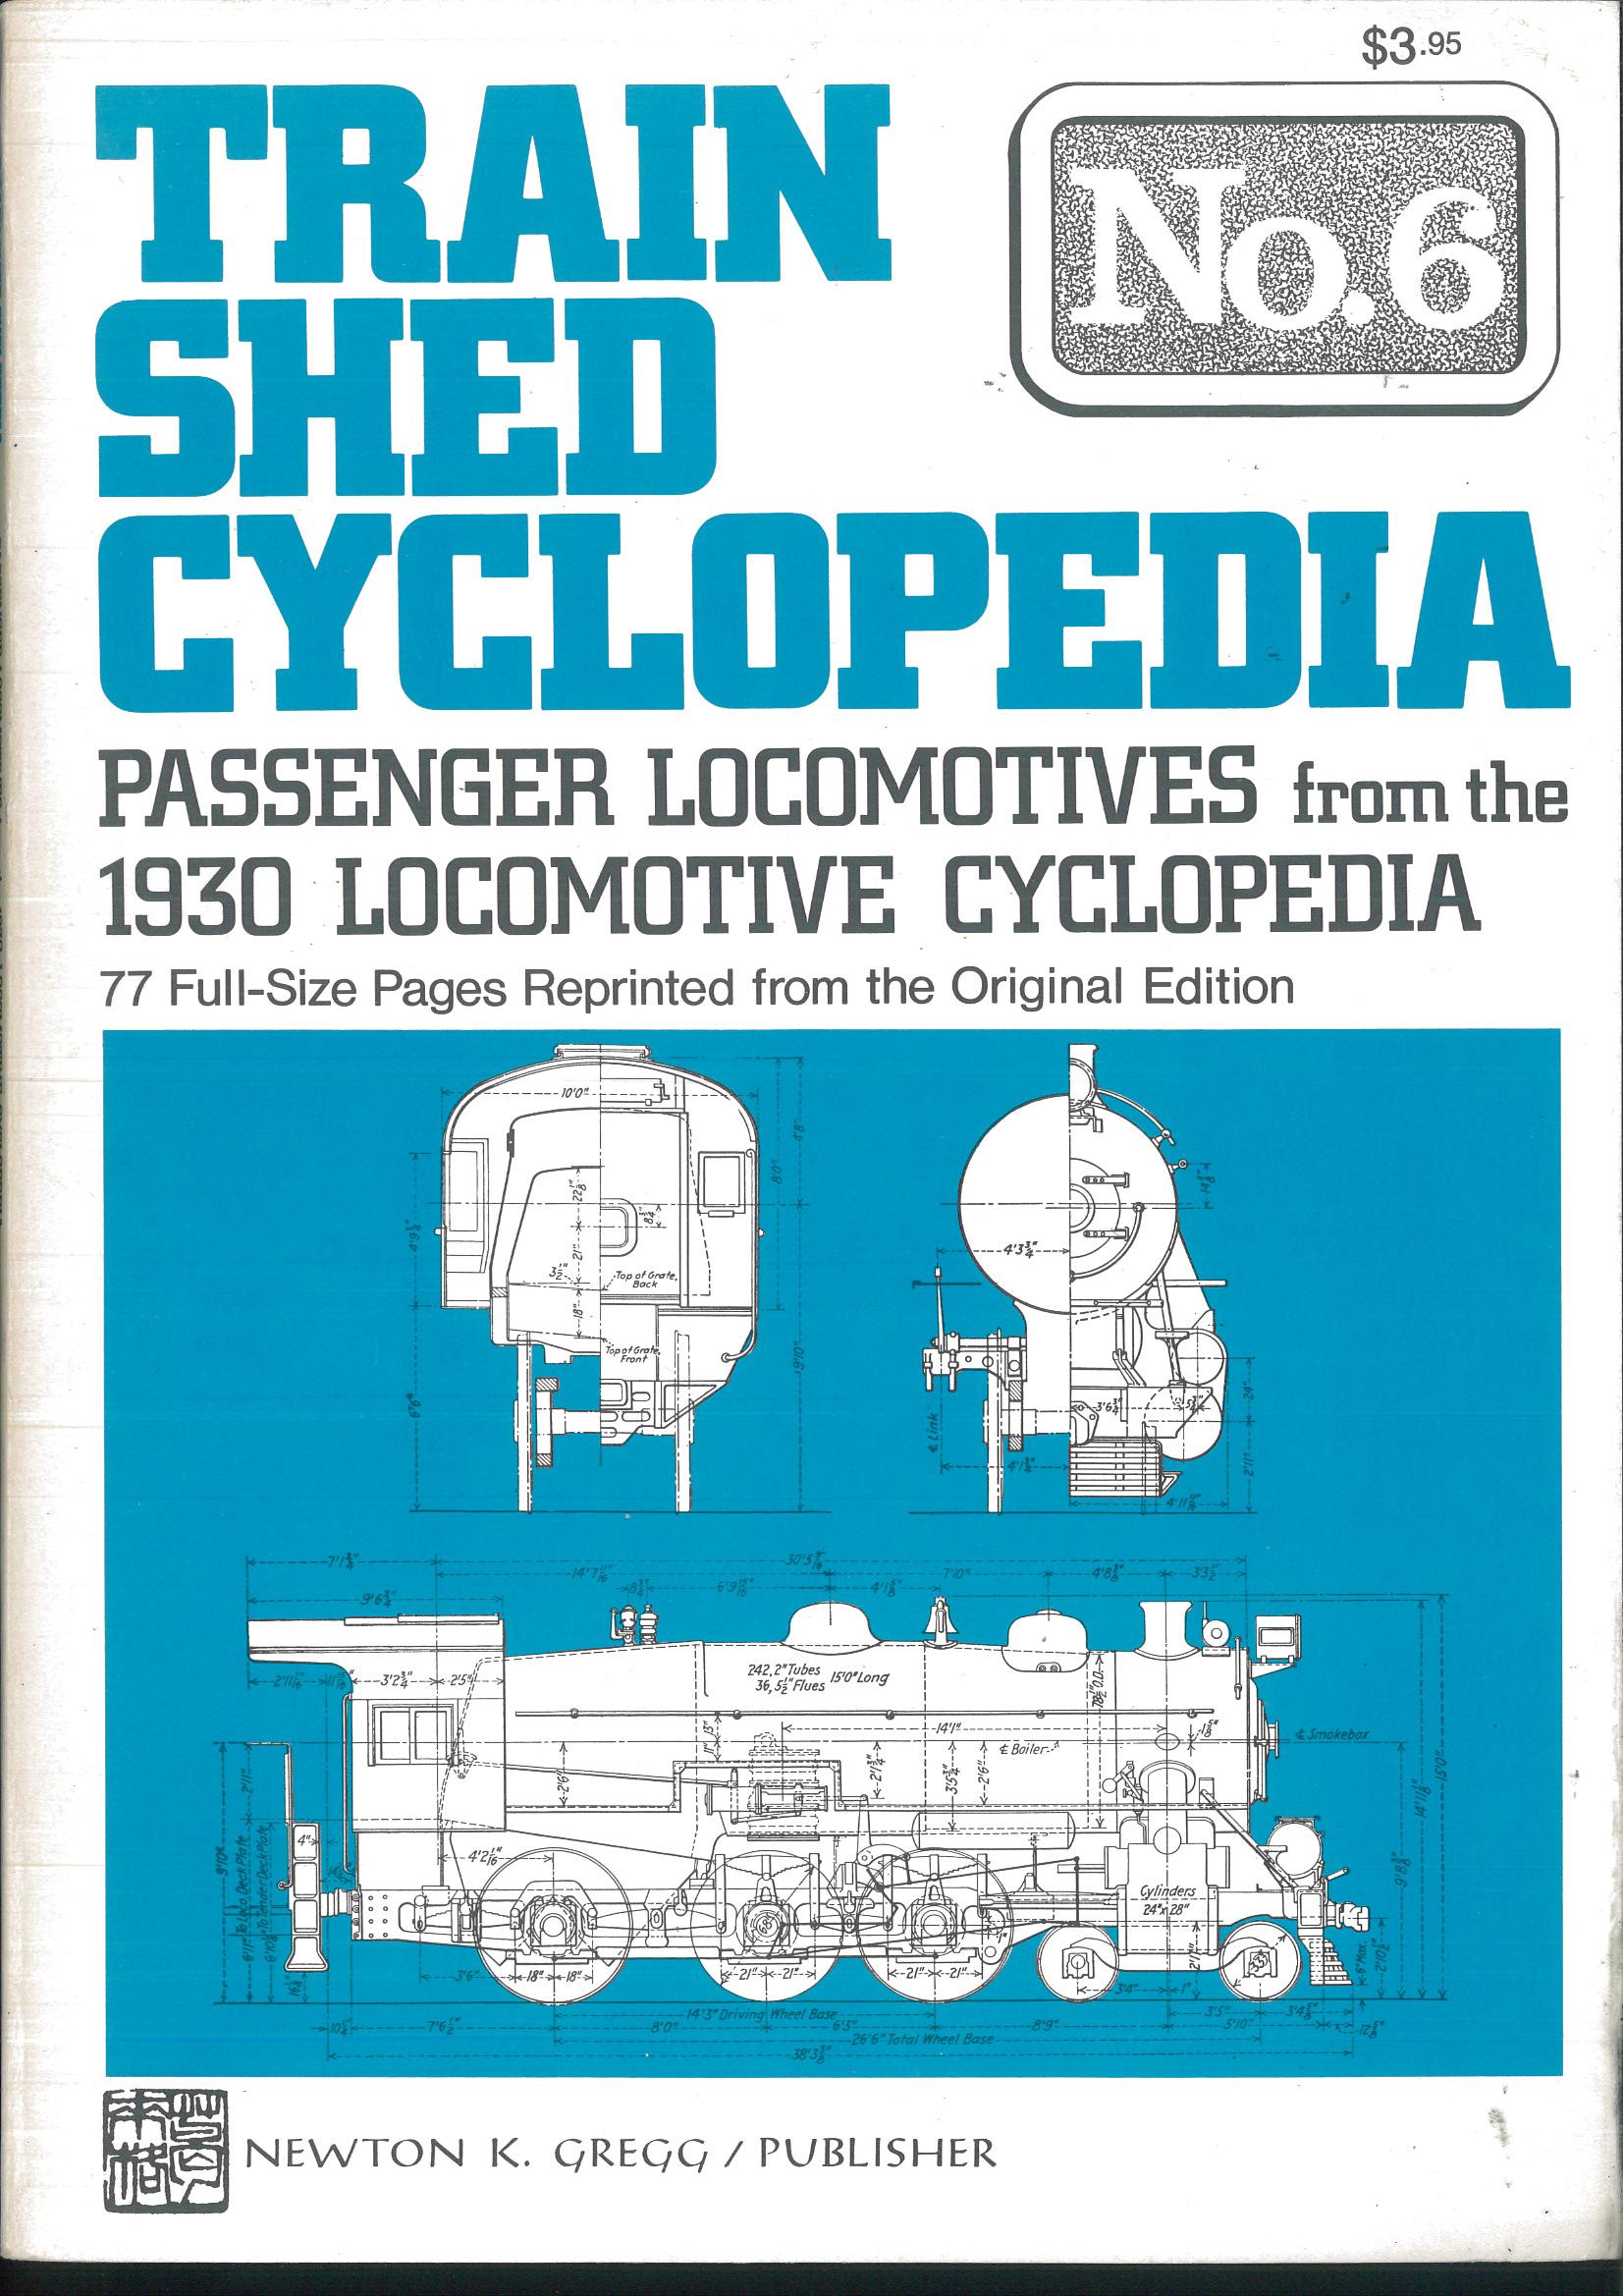 Train Shed Cyclopedia No. 6 -Passenger Locomotives from the 1930 Locomotive Cyclopedia  | günstig bestellen bei Modelleisenbahn Center  MCS Vertriebs GmbH